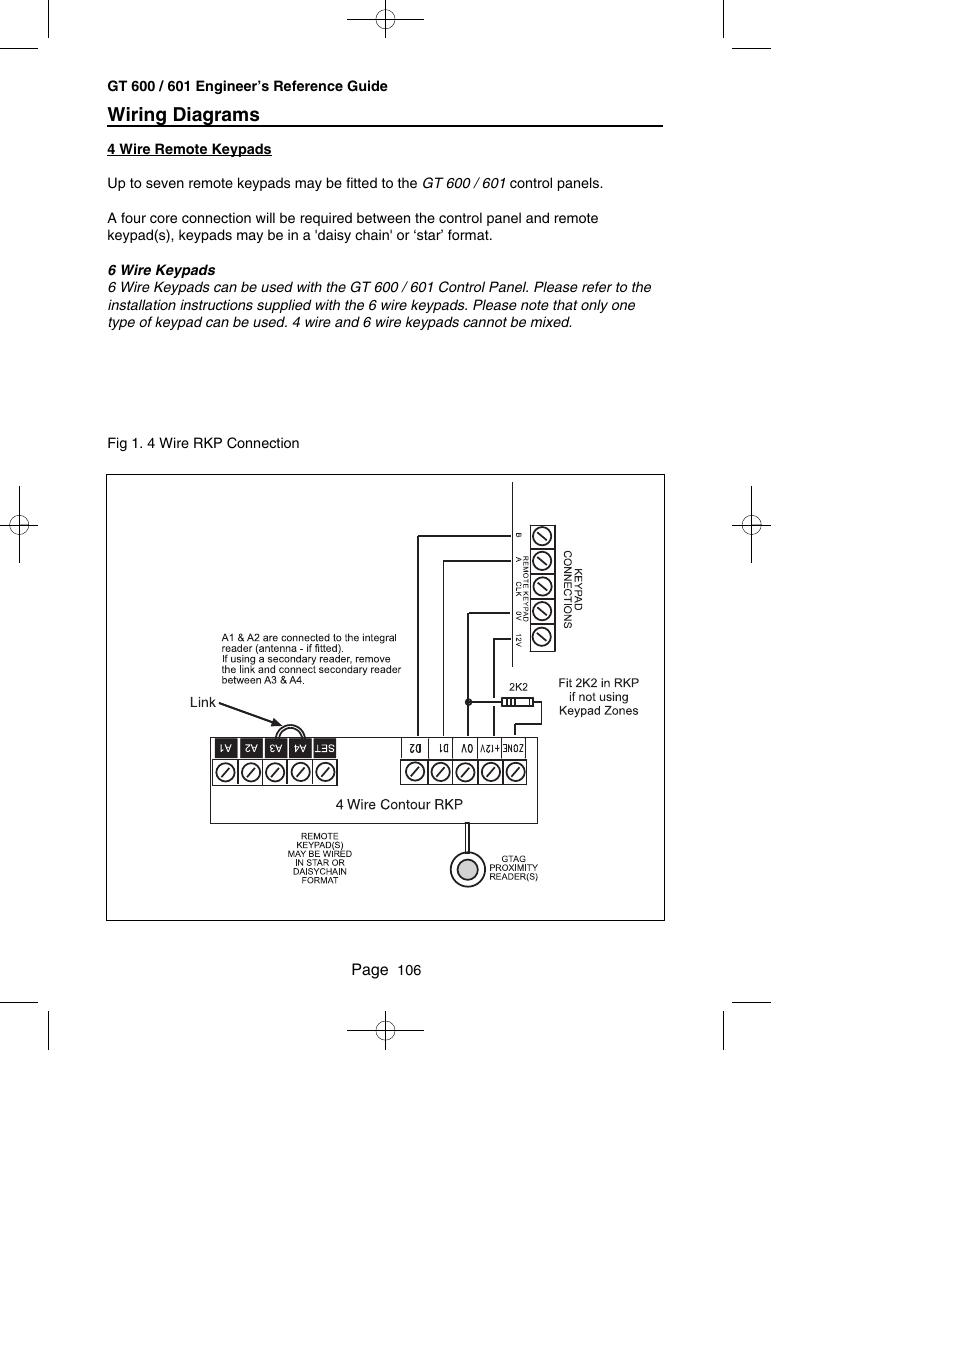 medium resolution of 4 wire diagram control keypad